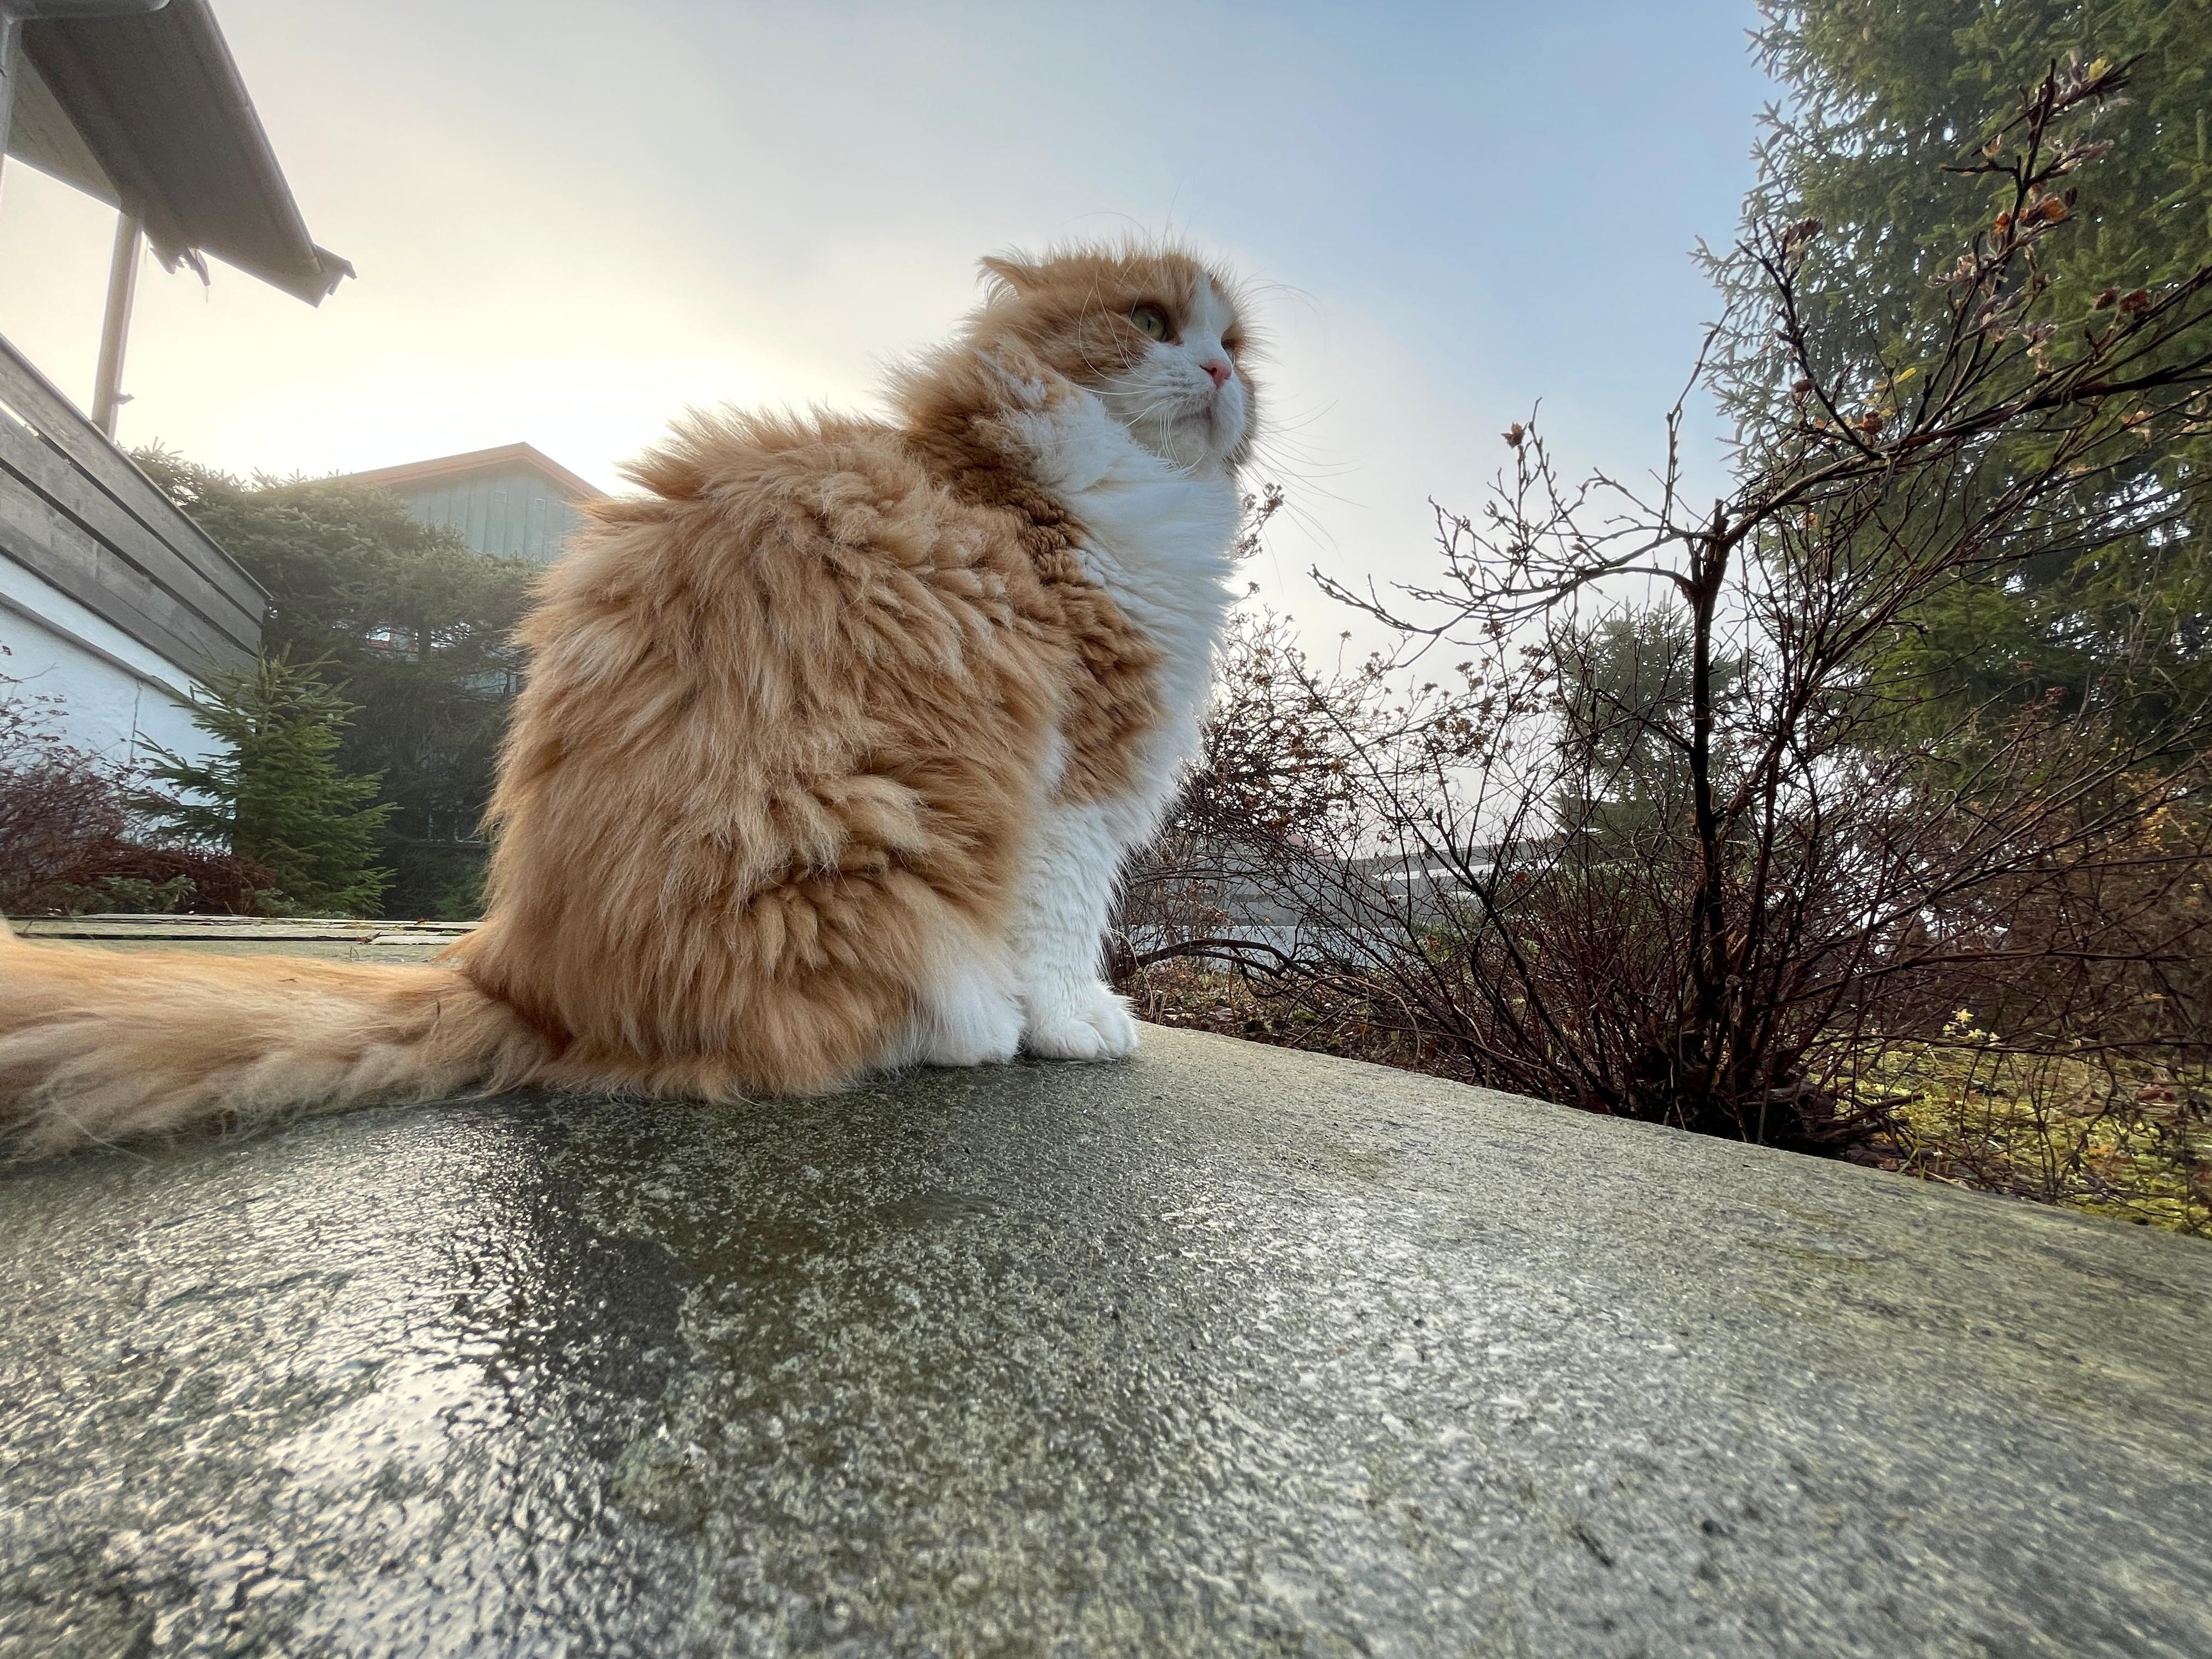 Katt fanget i vidvinkel.